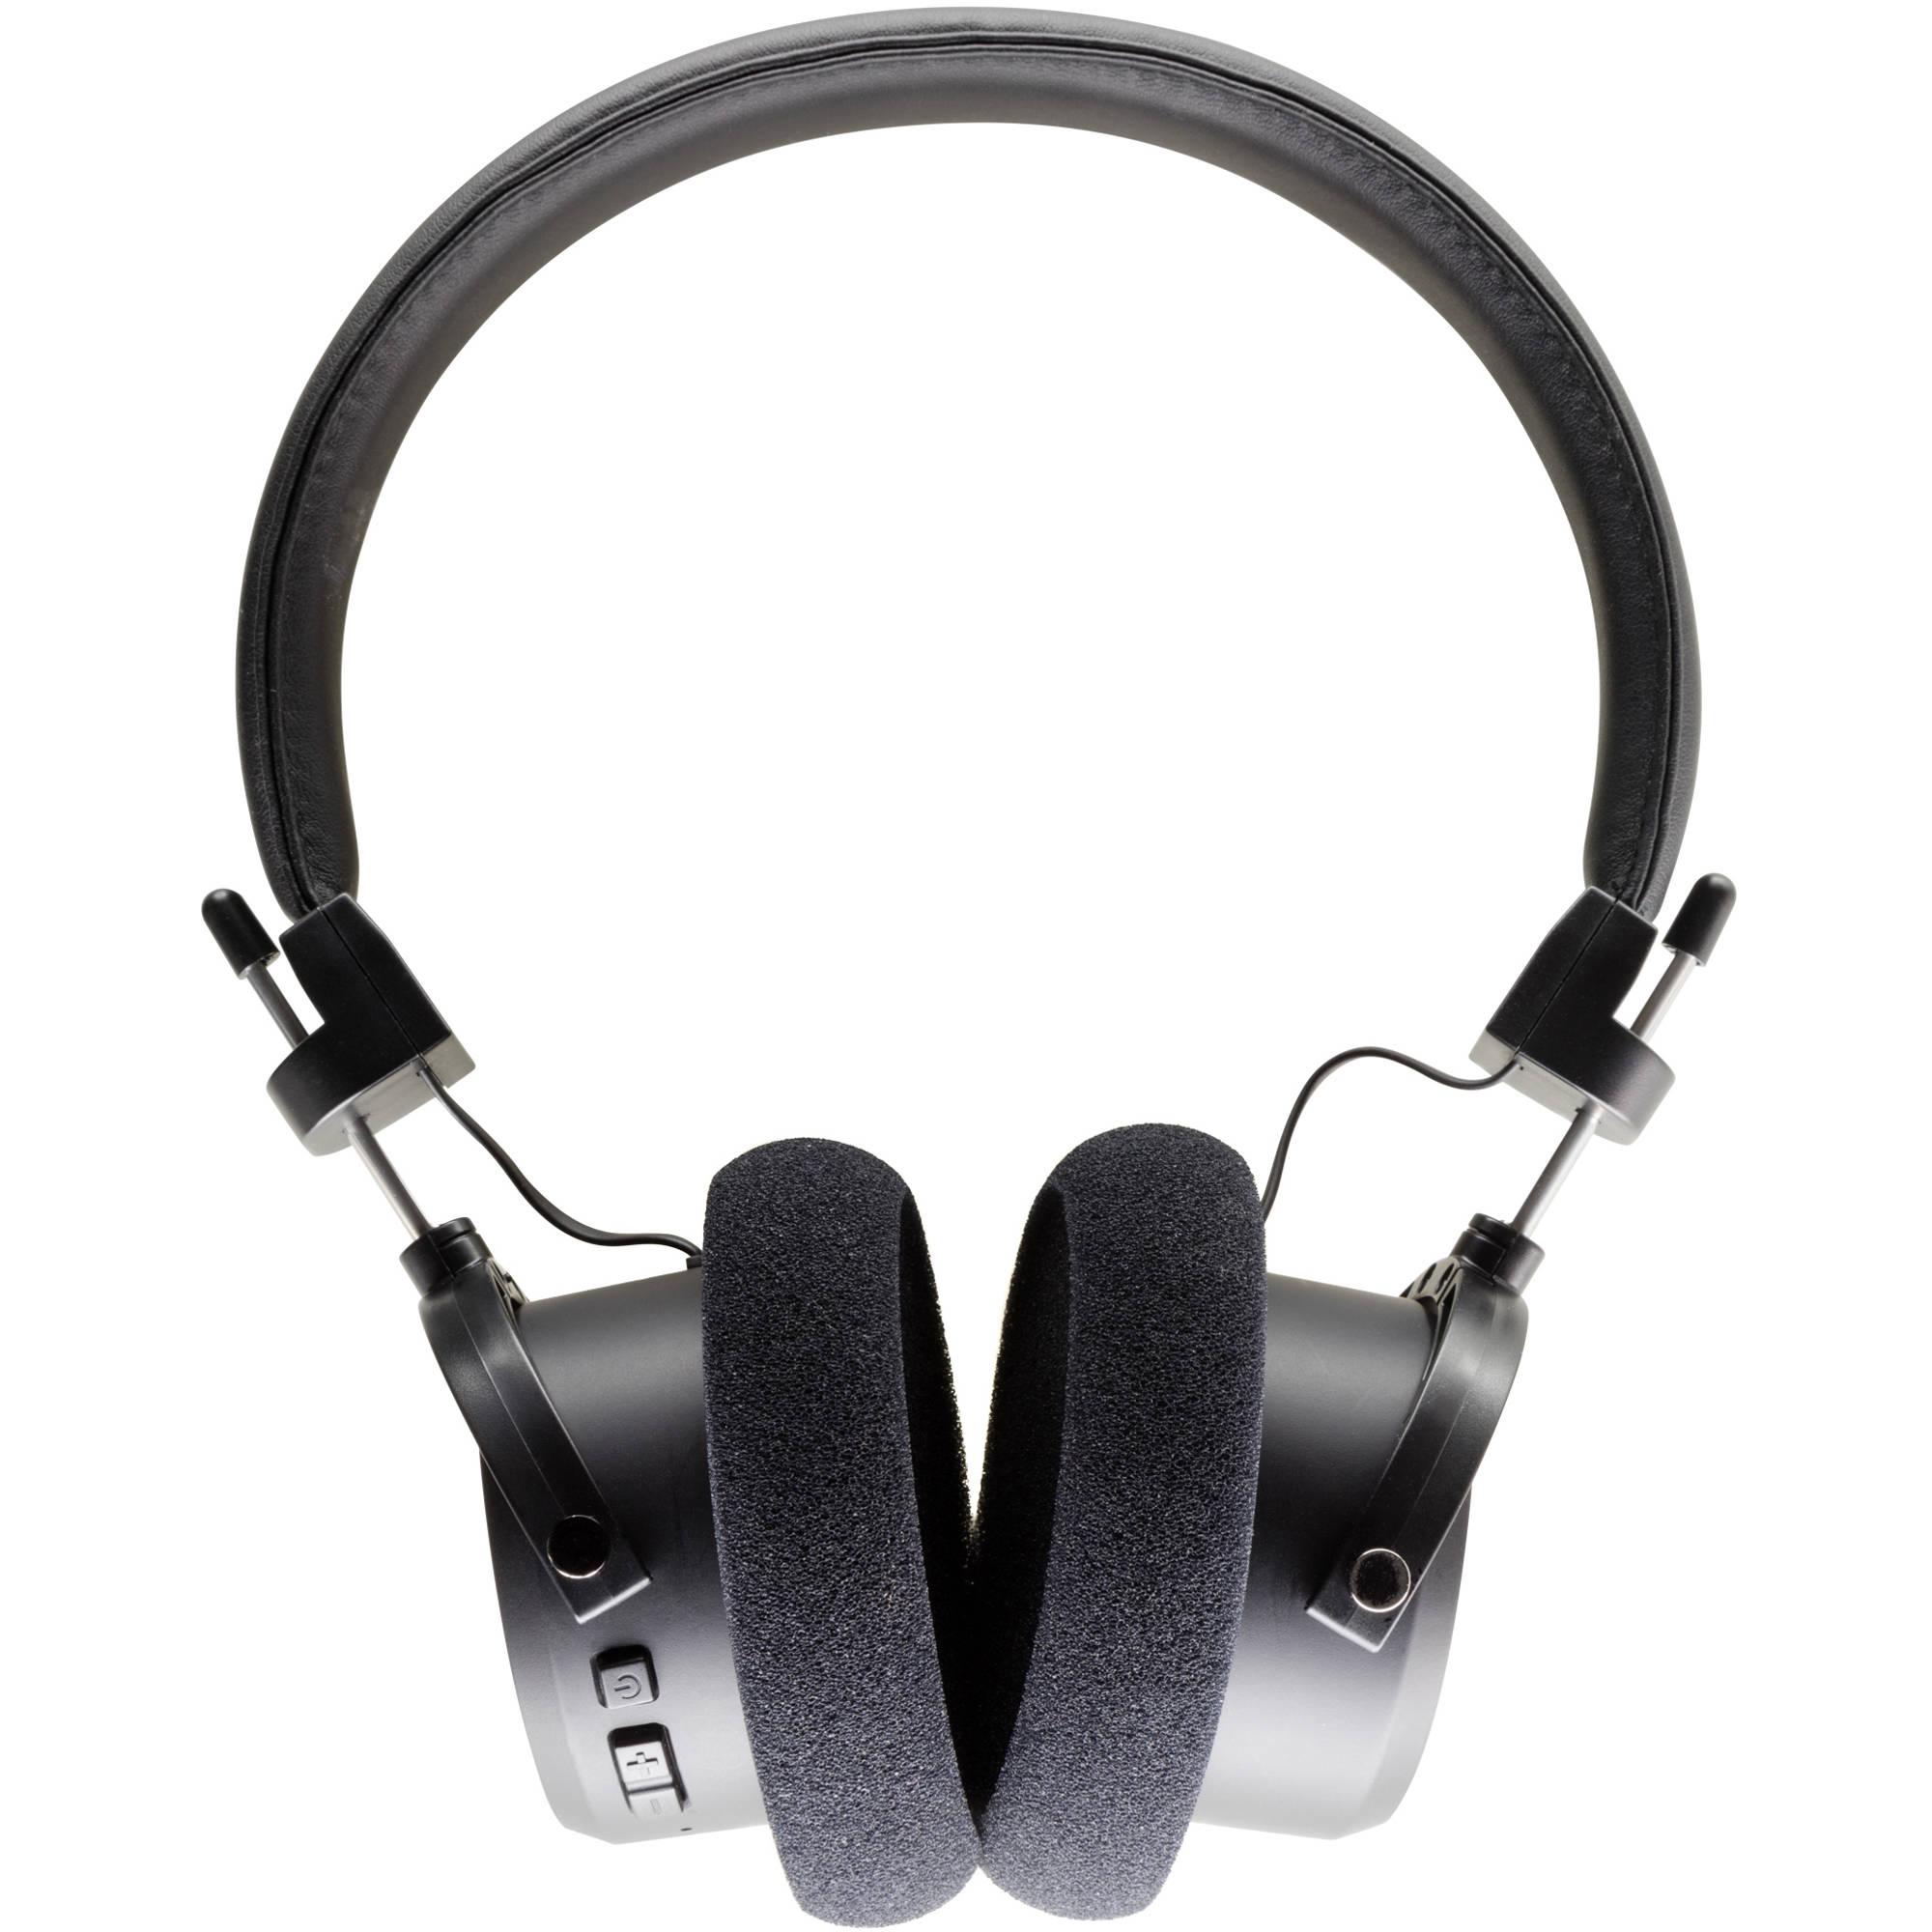 f5365d9049e Grado GW100 Wireless Over-Ear Headphones GW100 B&H Photo Video